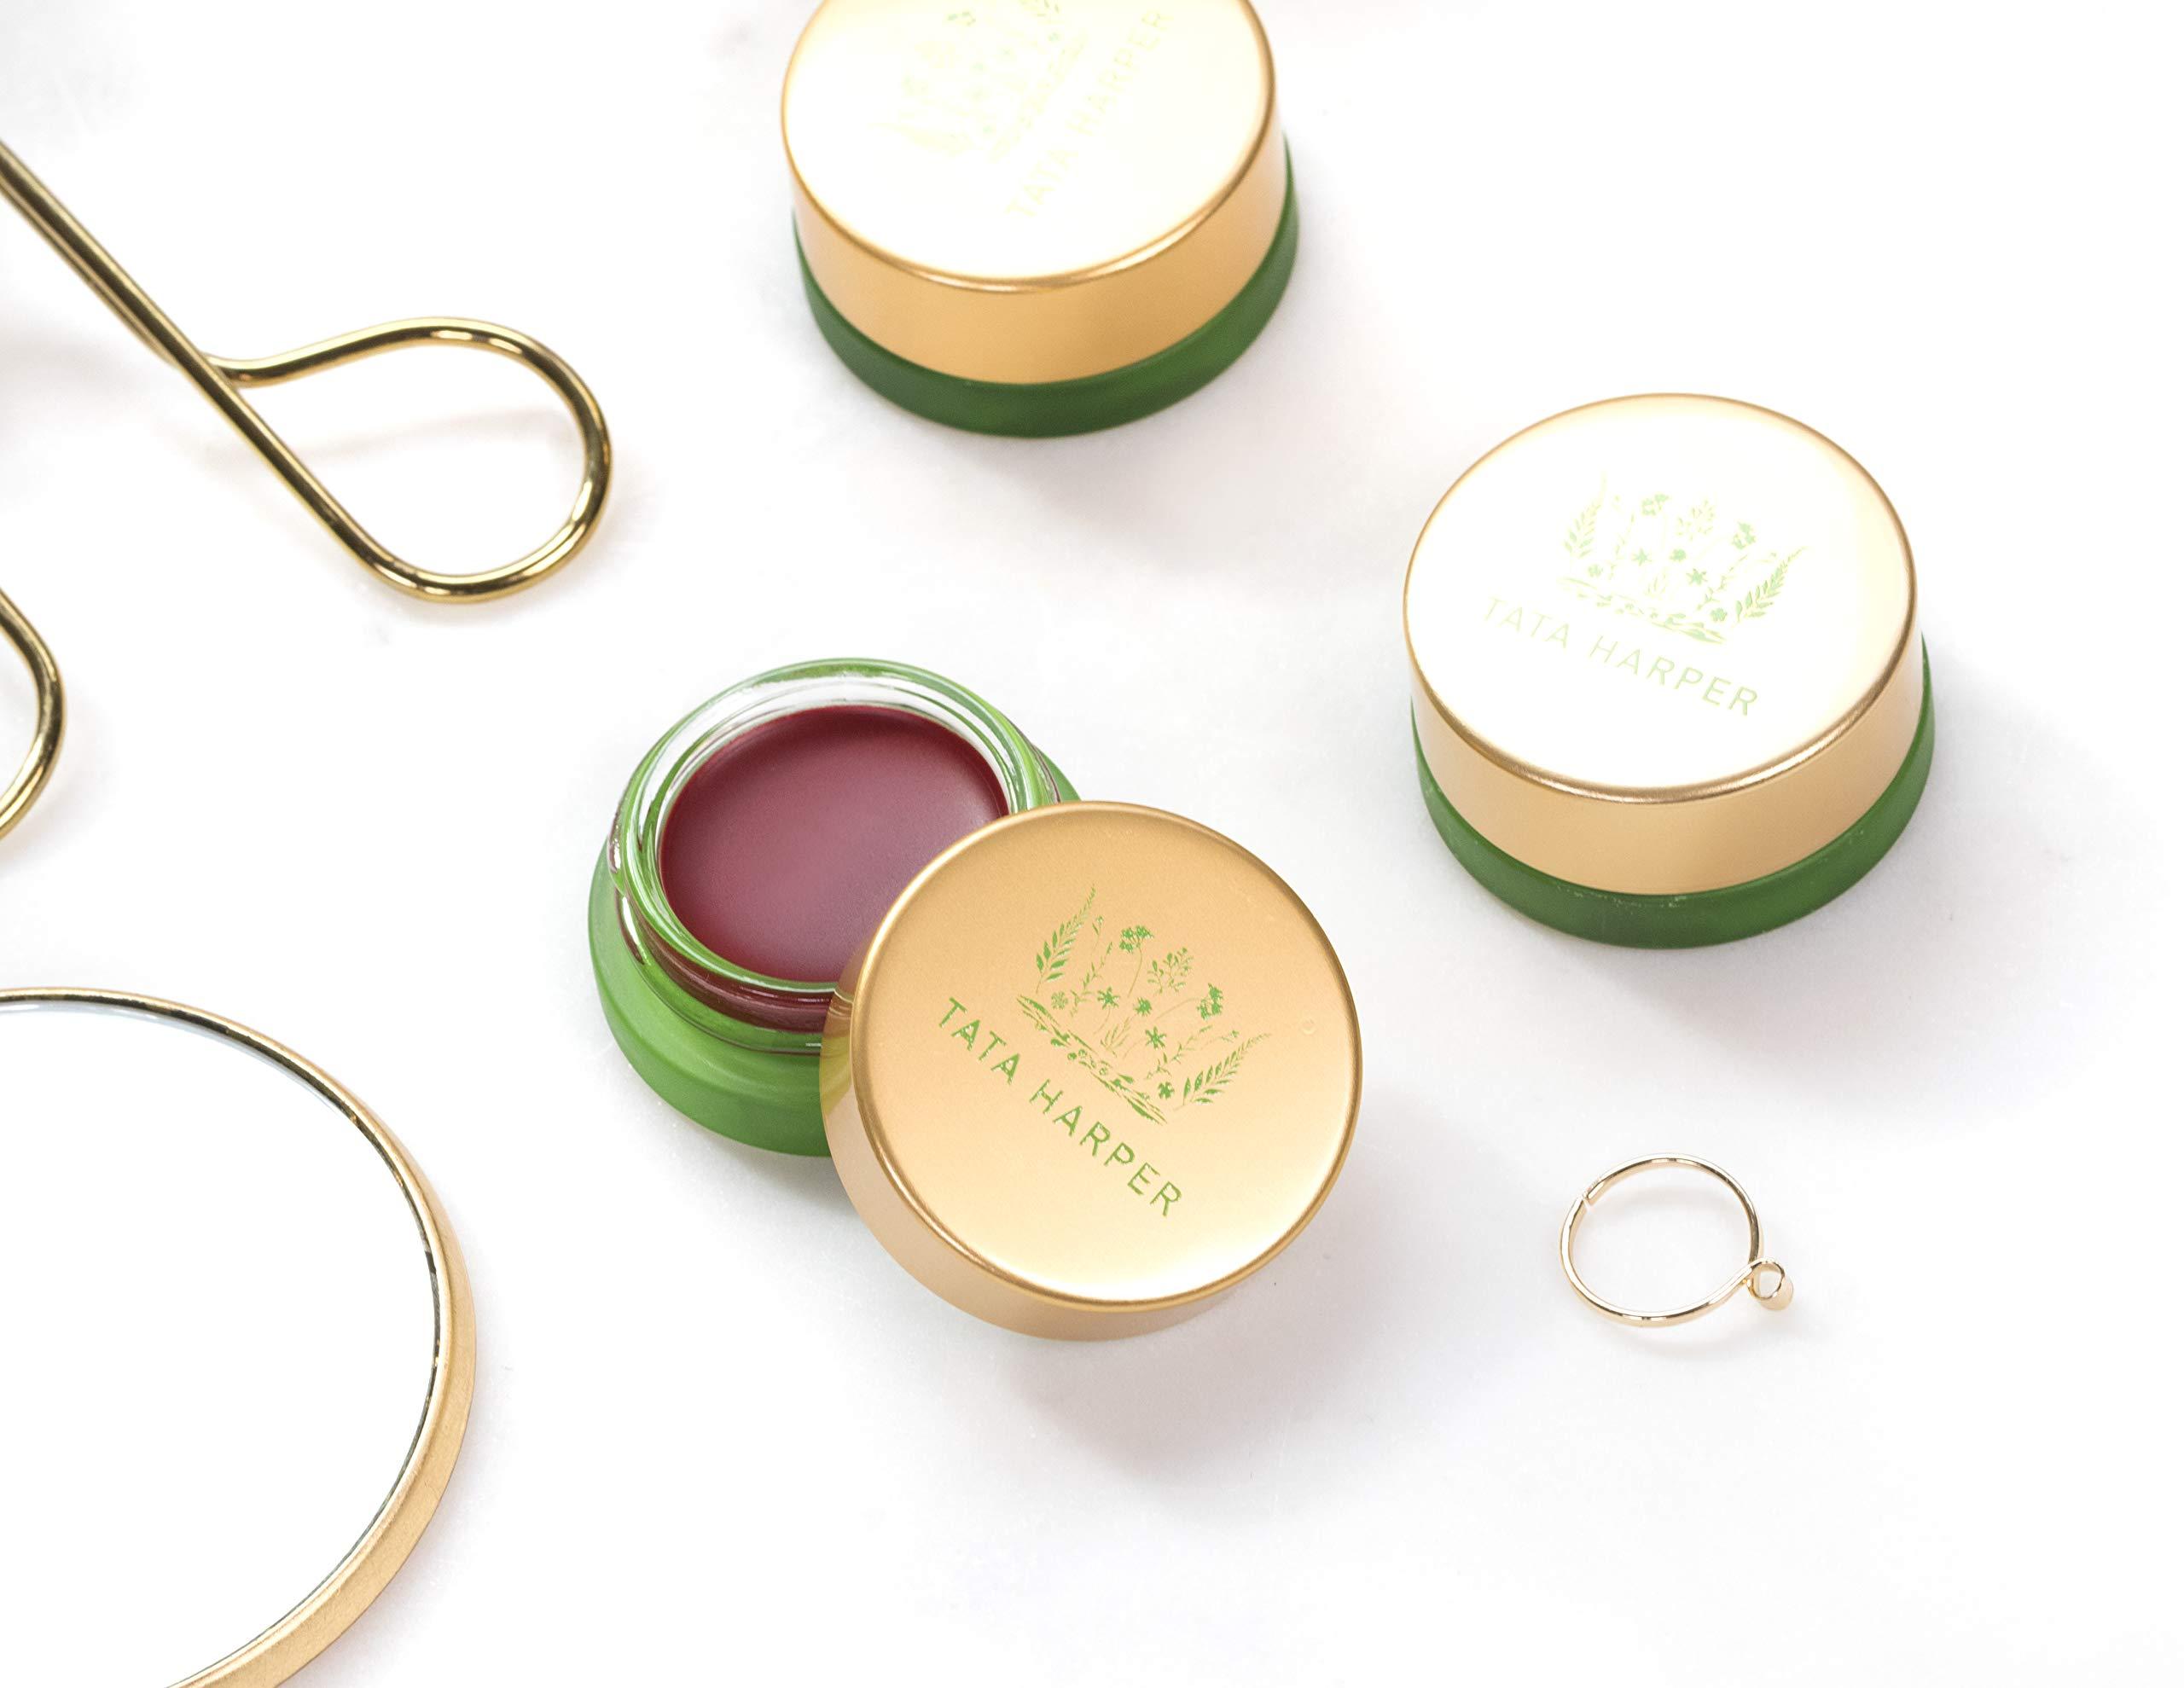 Tata Harper Volumizing Lip and Cheek Tint - Very Naughty | 100% Natural & Nontoxic | Ruby Red Cheek & Lip Tint | 4.5g by Tata Harper